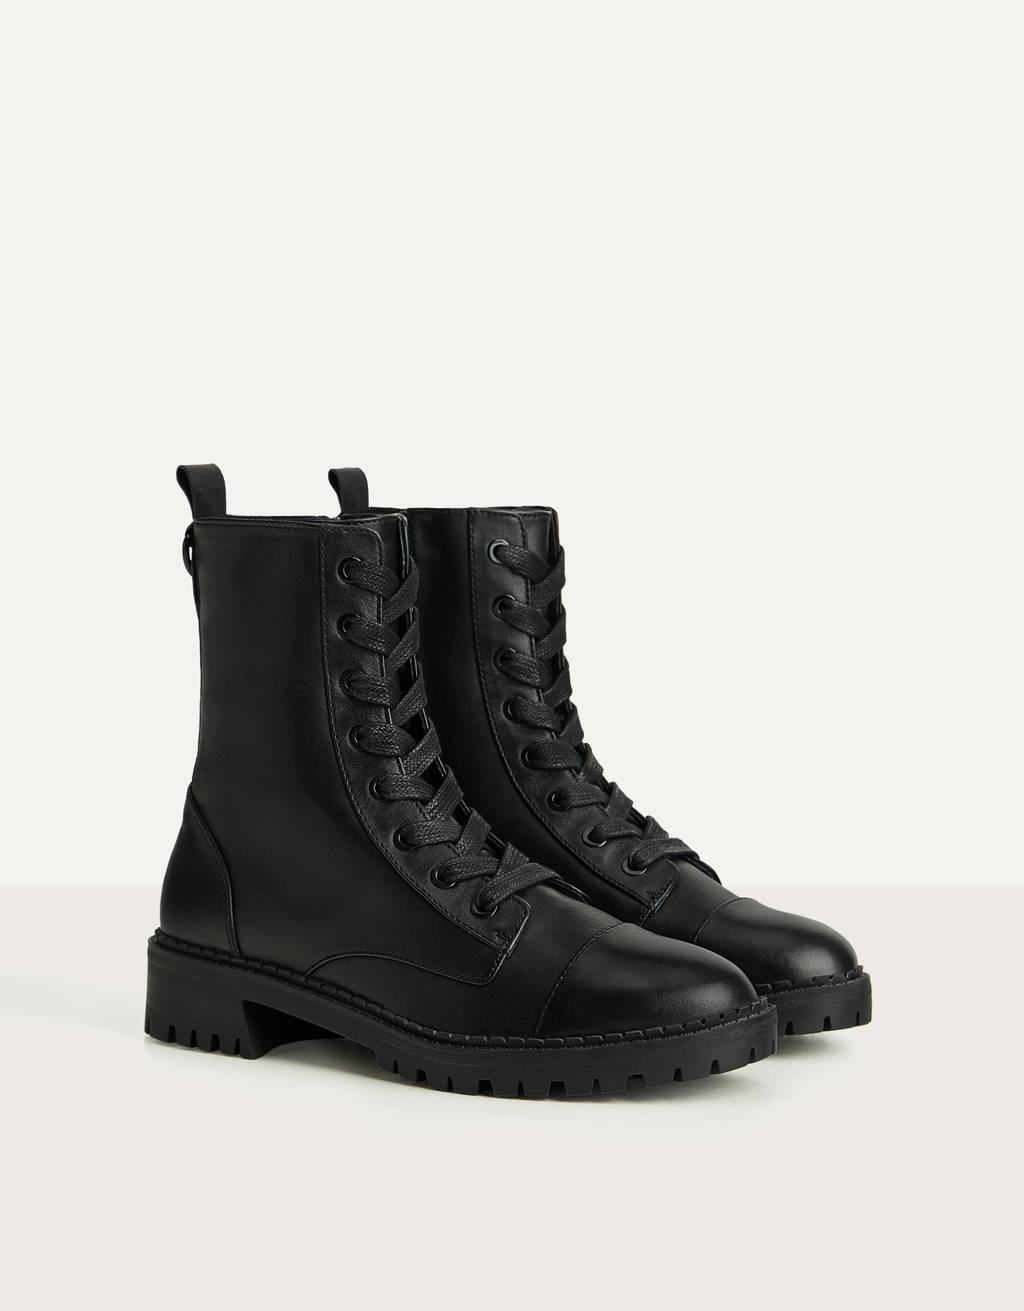 c84394bdaa728 Flat LEATHER ankle boots - Skirts - Bershka Greece